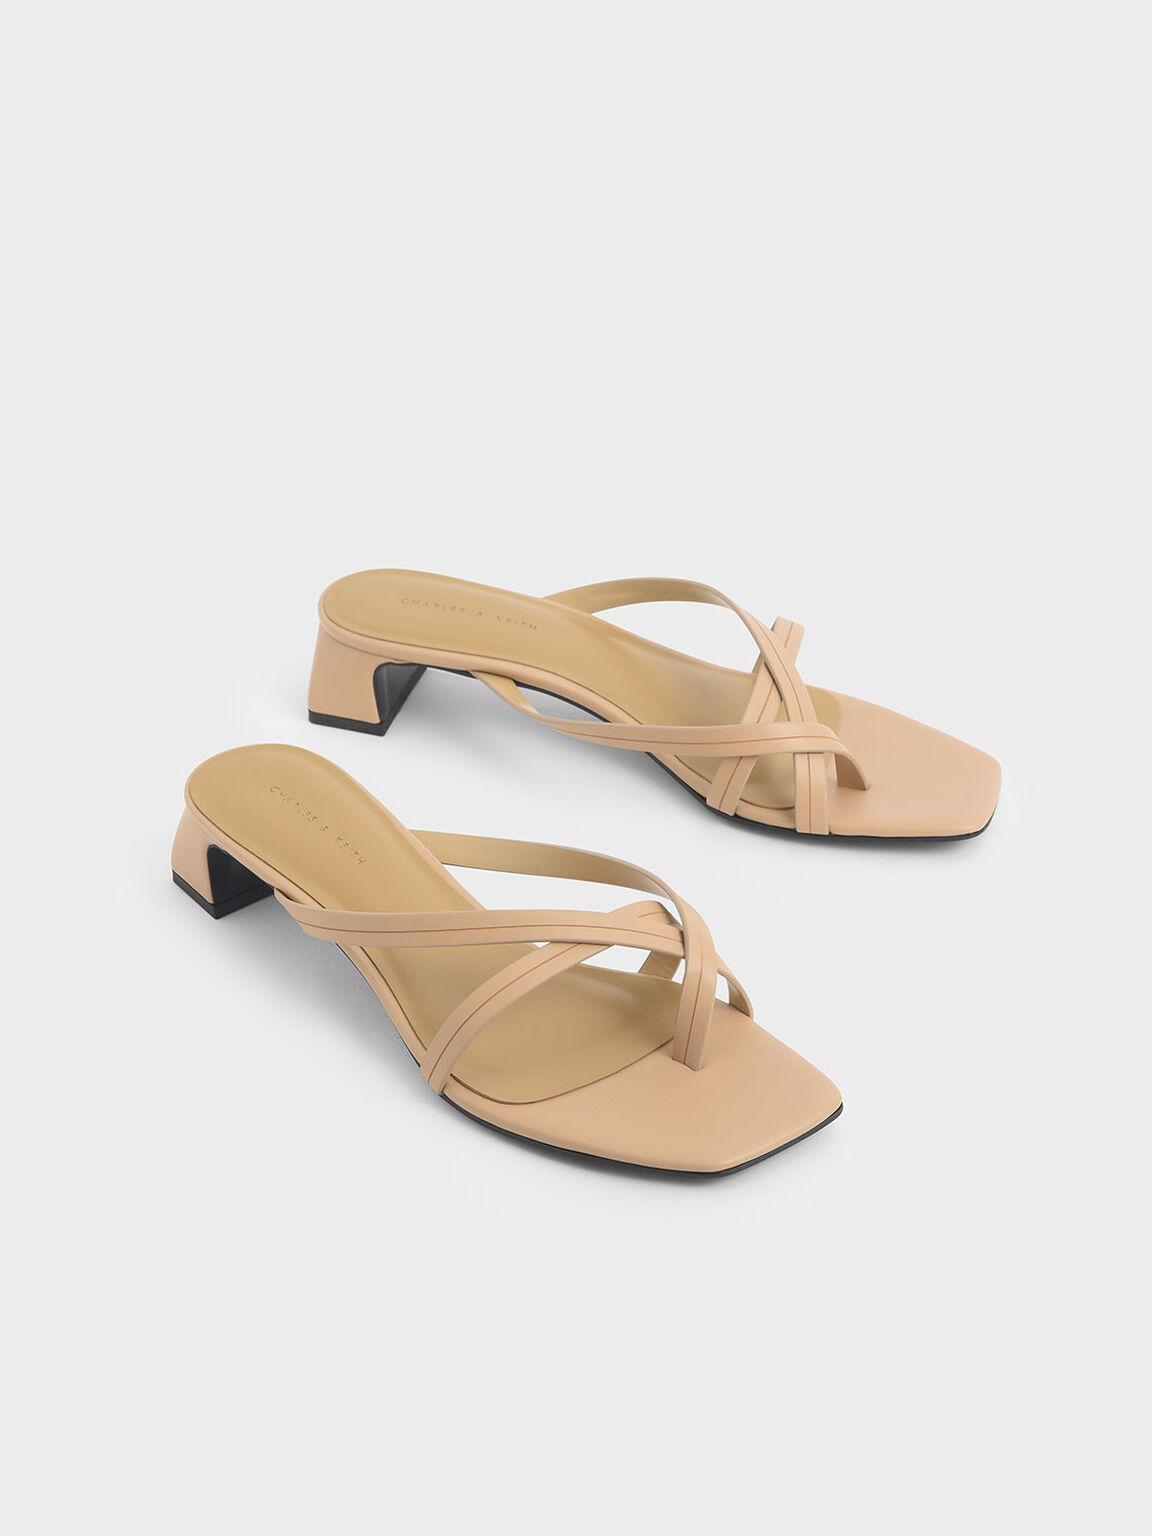 Strappy Toe Loop Heeled Sandals, Nude, hi-res